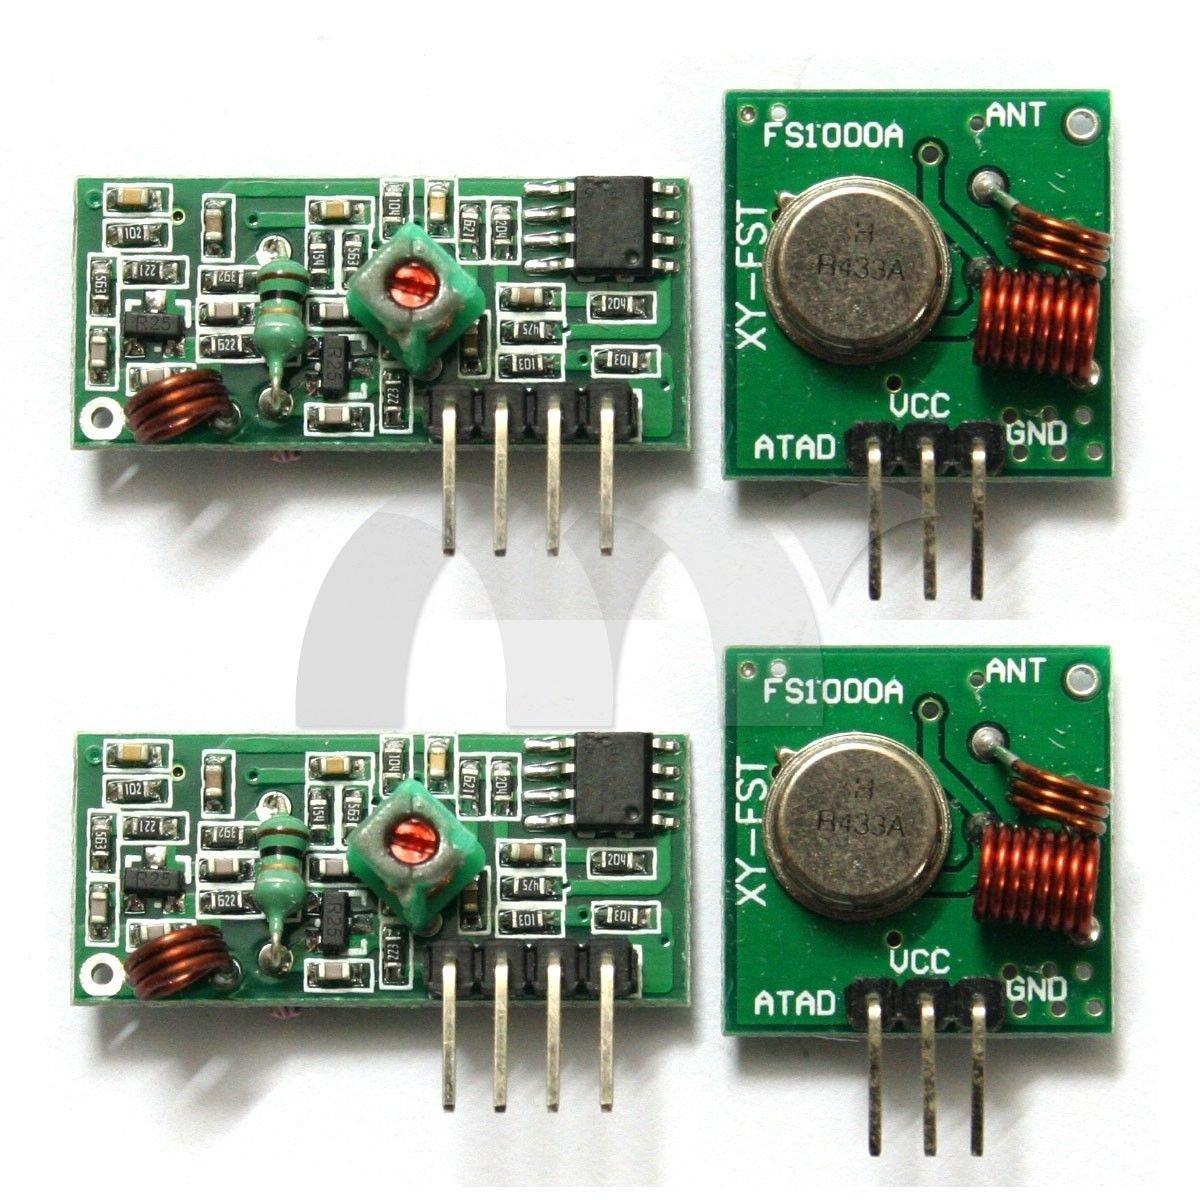 Buy Eztronics Corp® 2 Sets 433Mhz RF Transmitter Module and